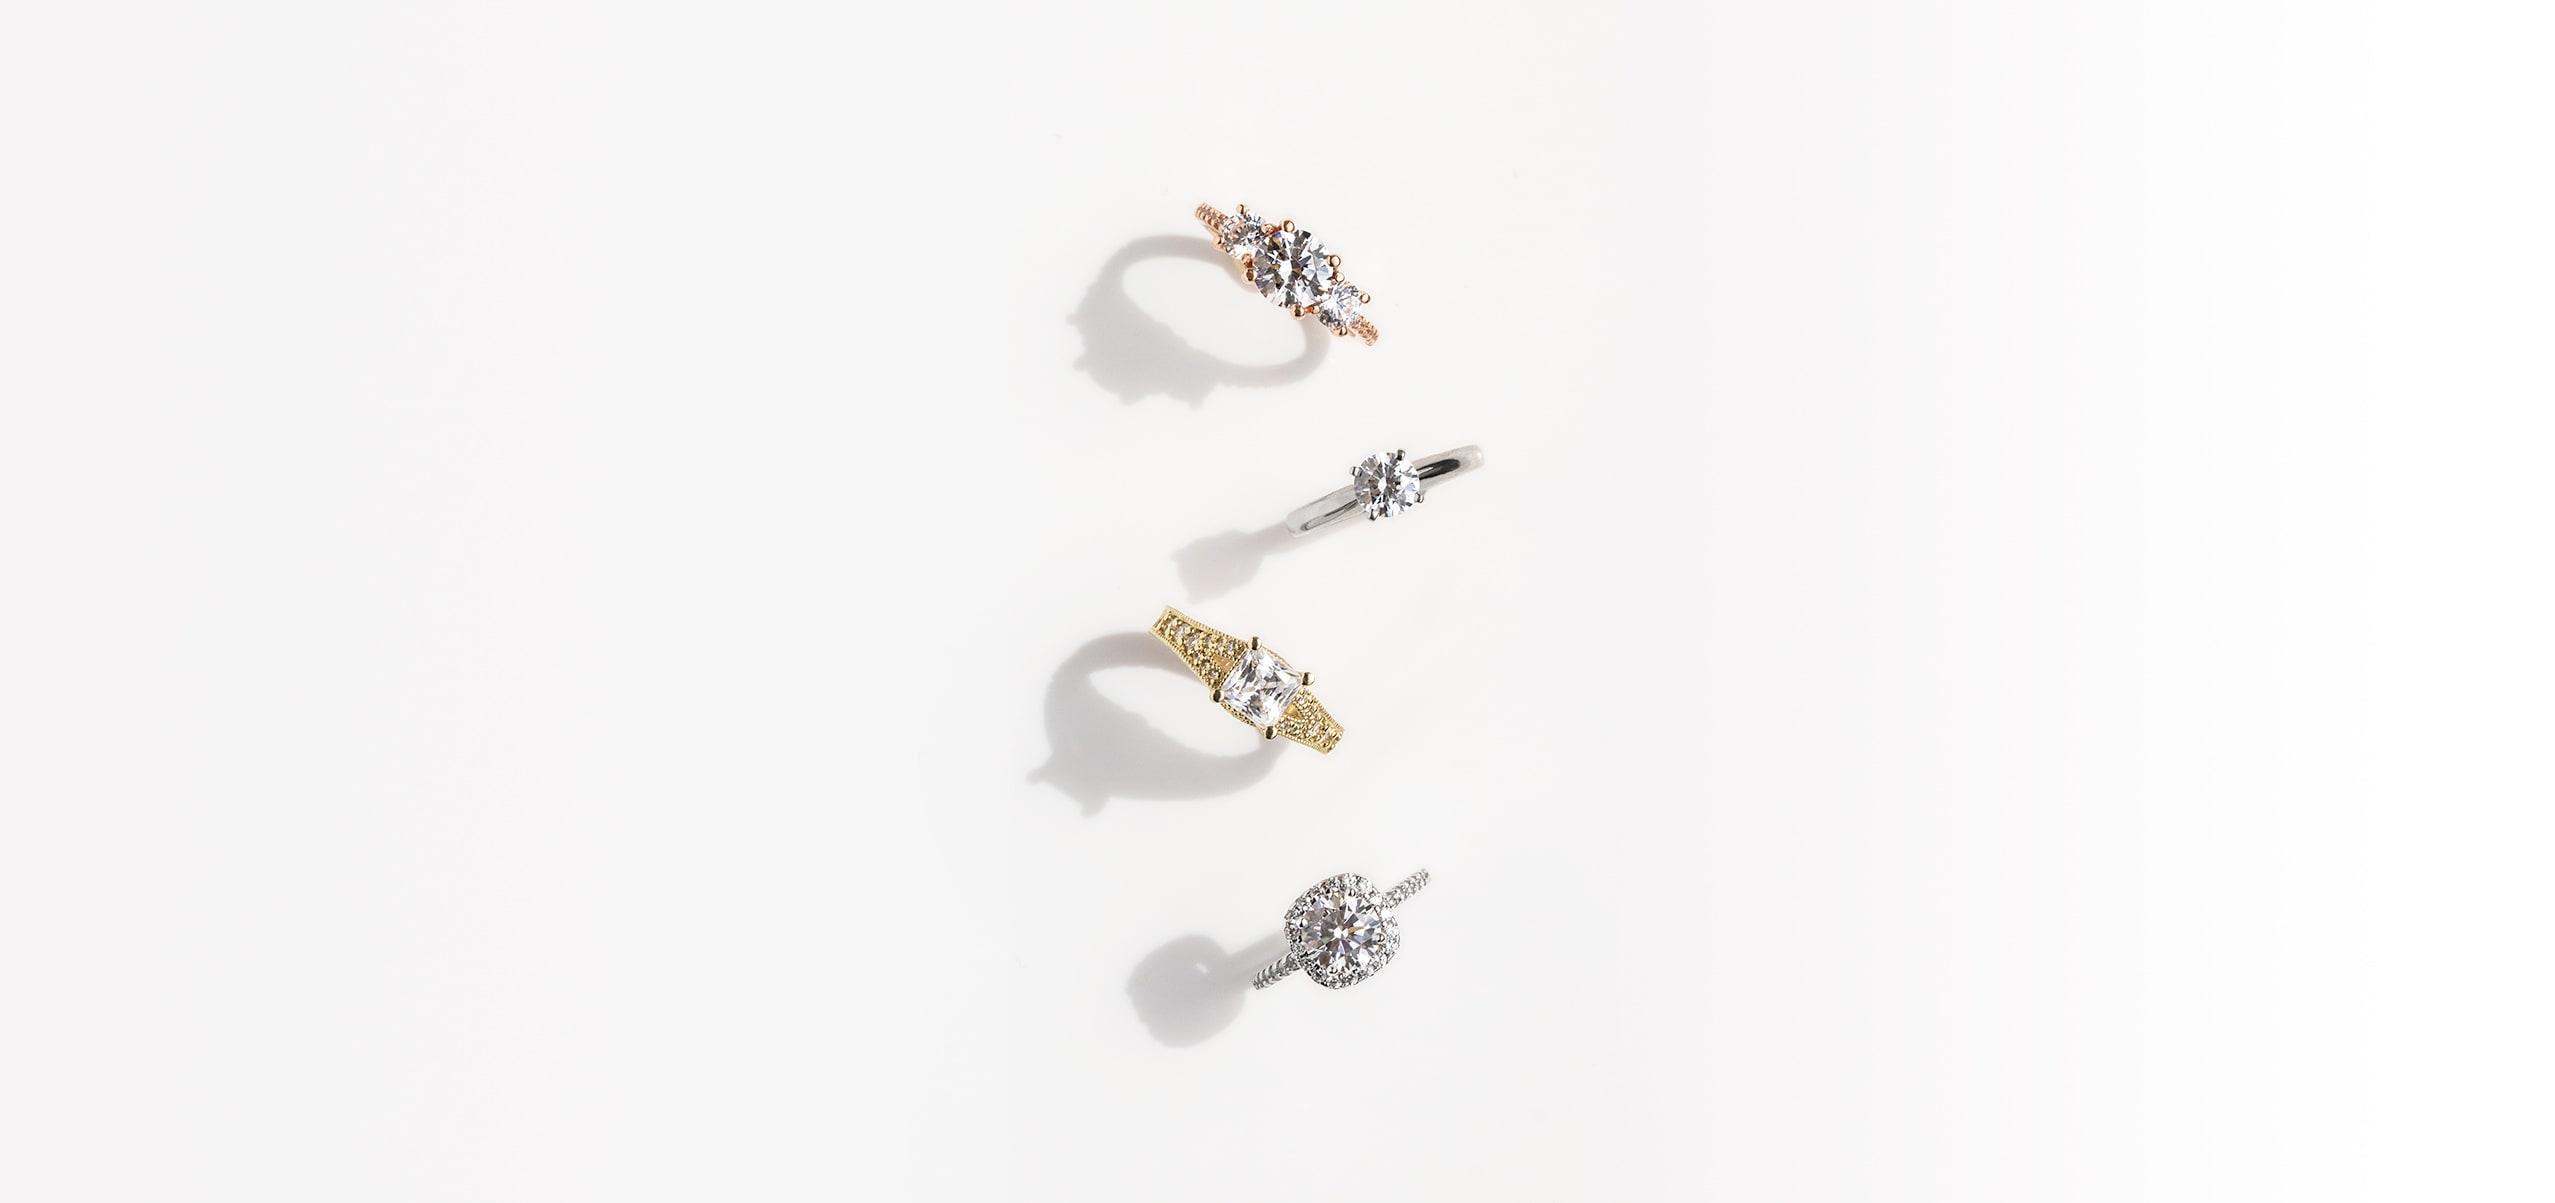 Four Diamond Nexus engagement rings.